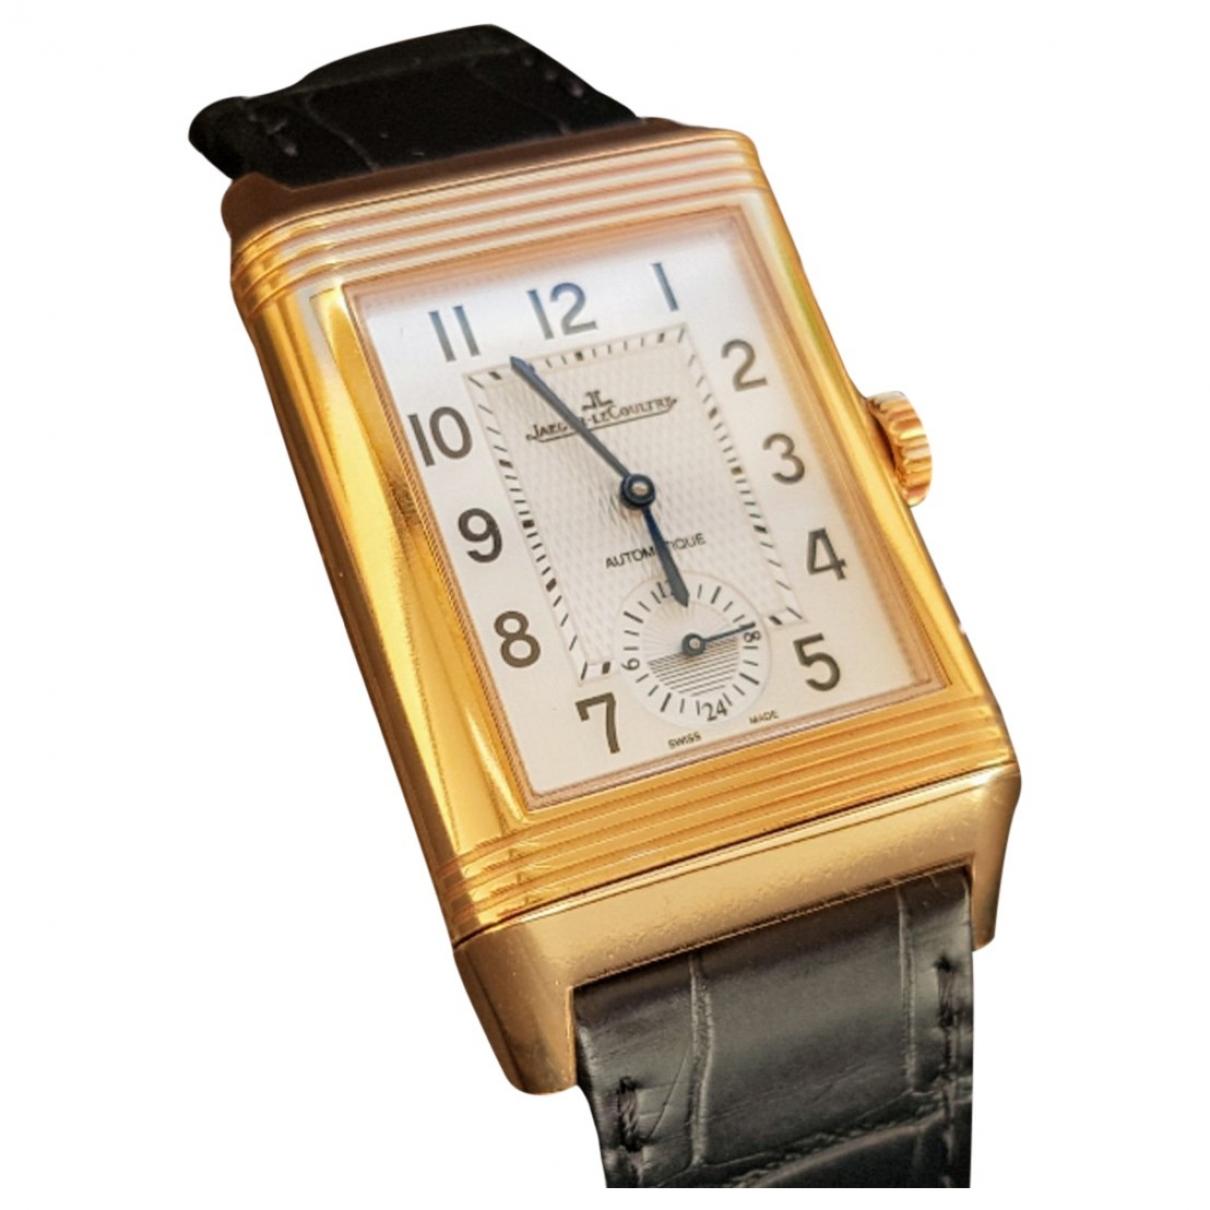 Relojes Reverso Grand Modele de Oro rosa Jaeger-lecoultre